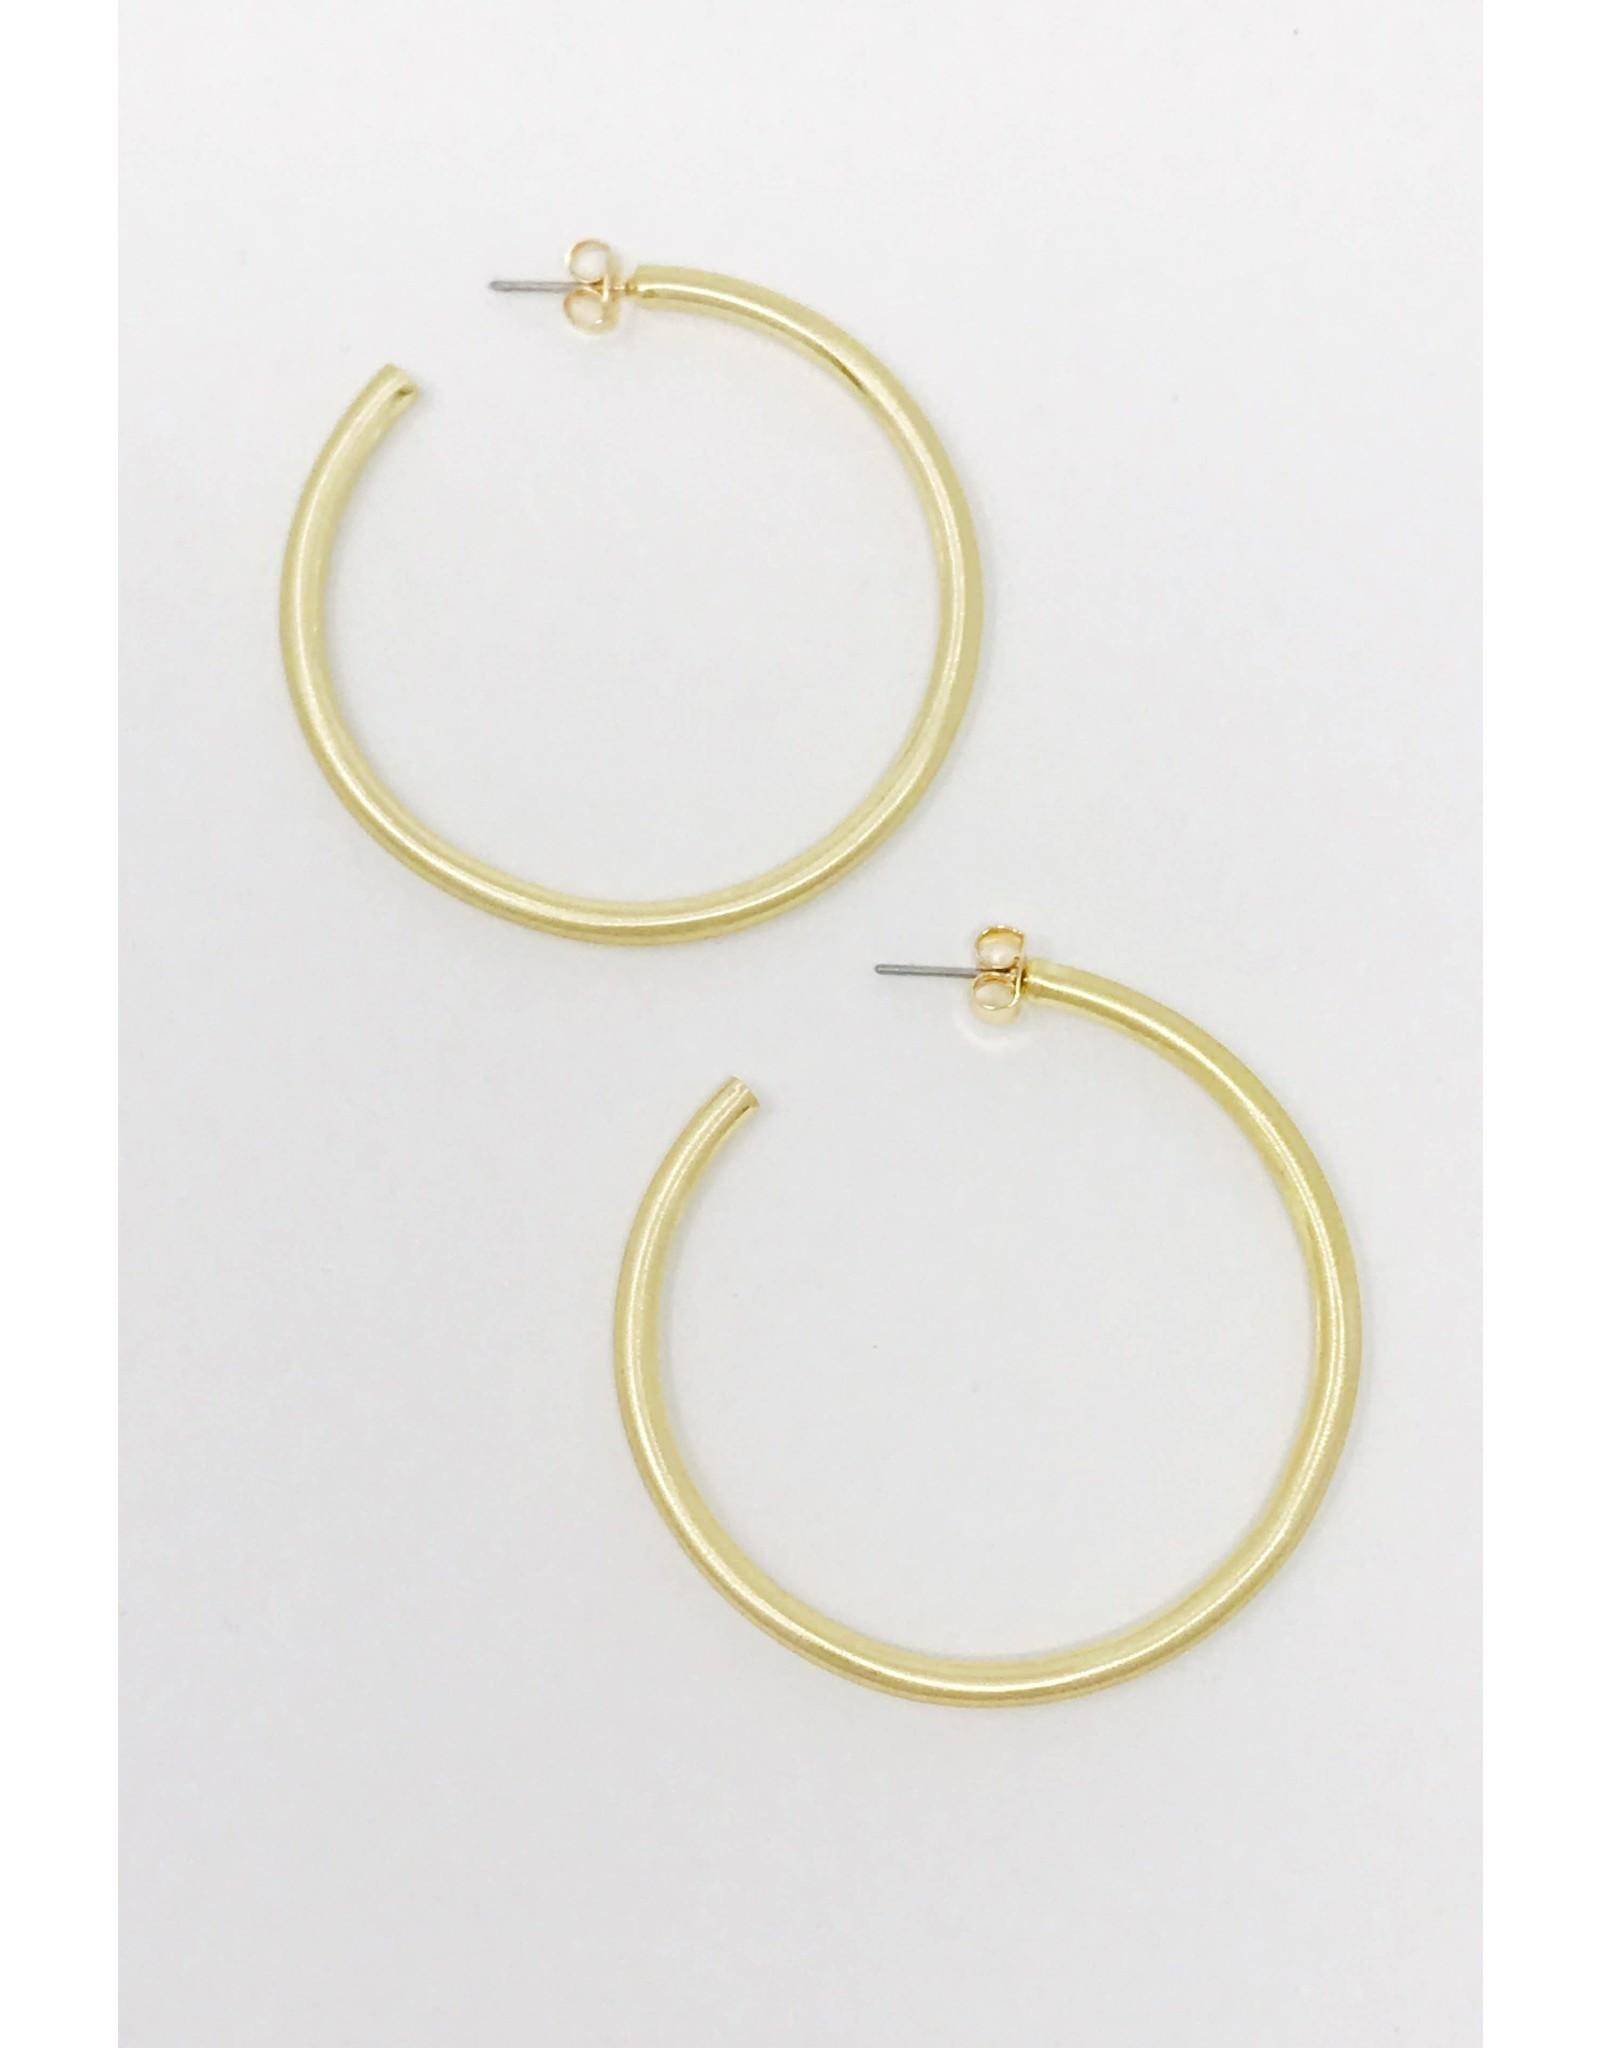 Jade Satin Finish Hoop Earrings